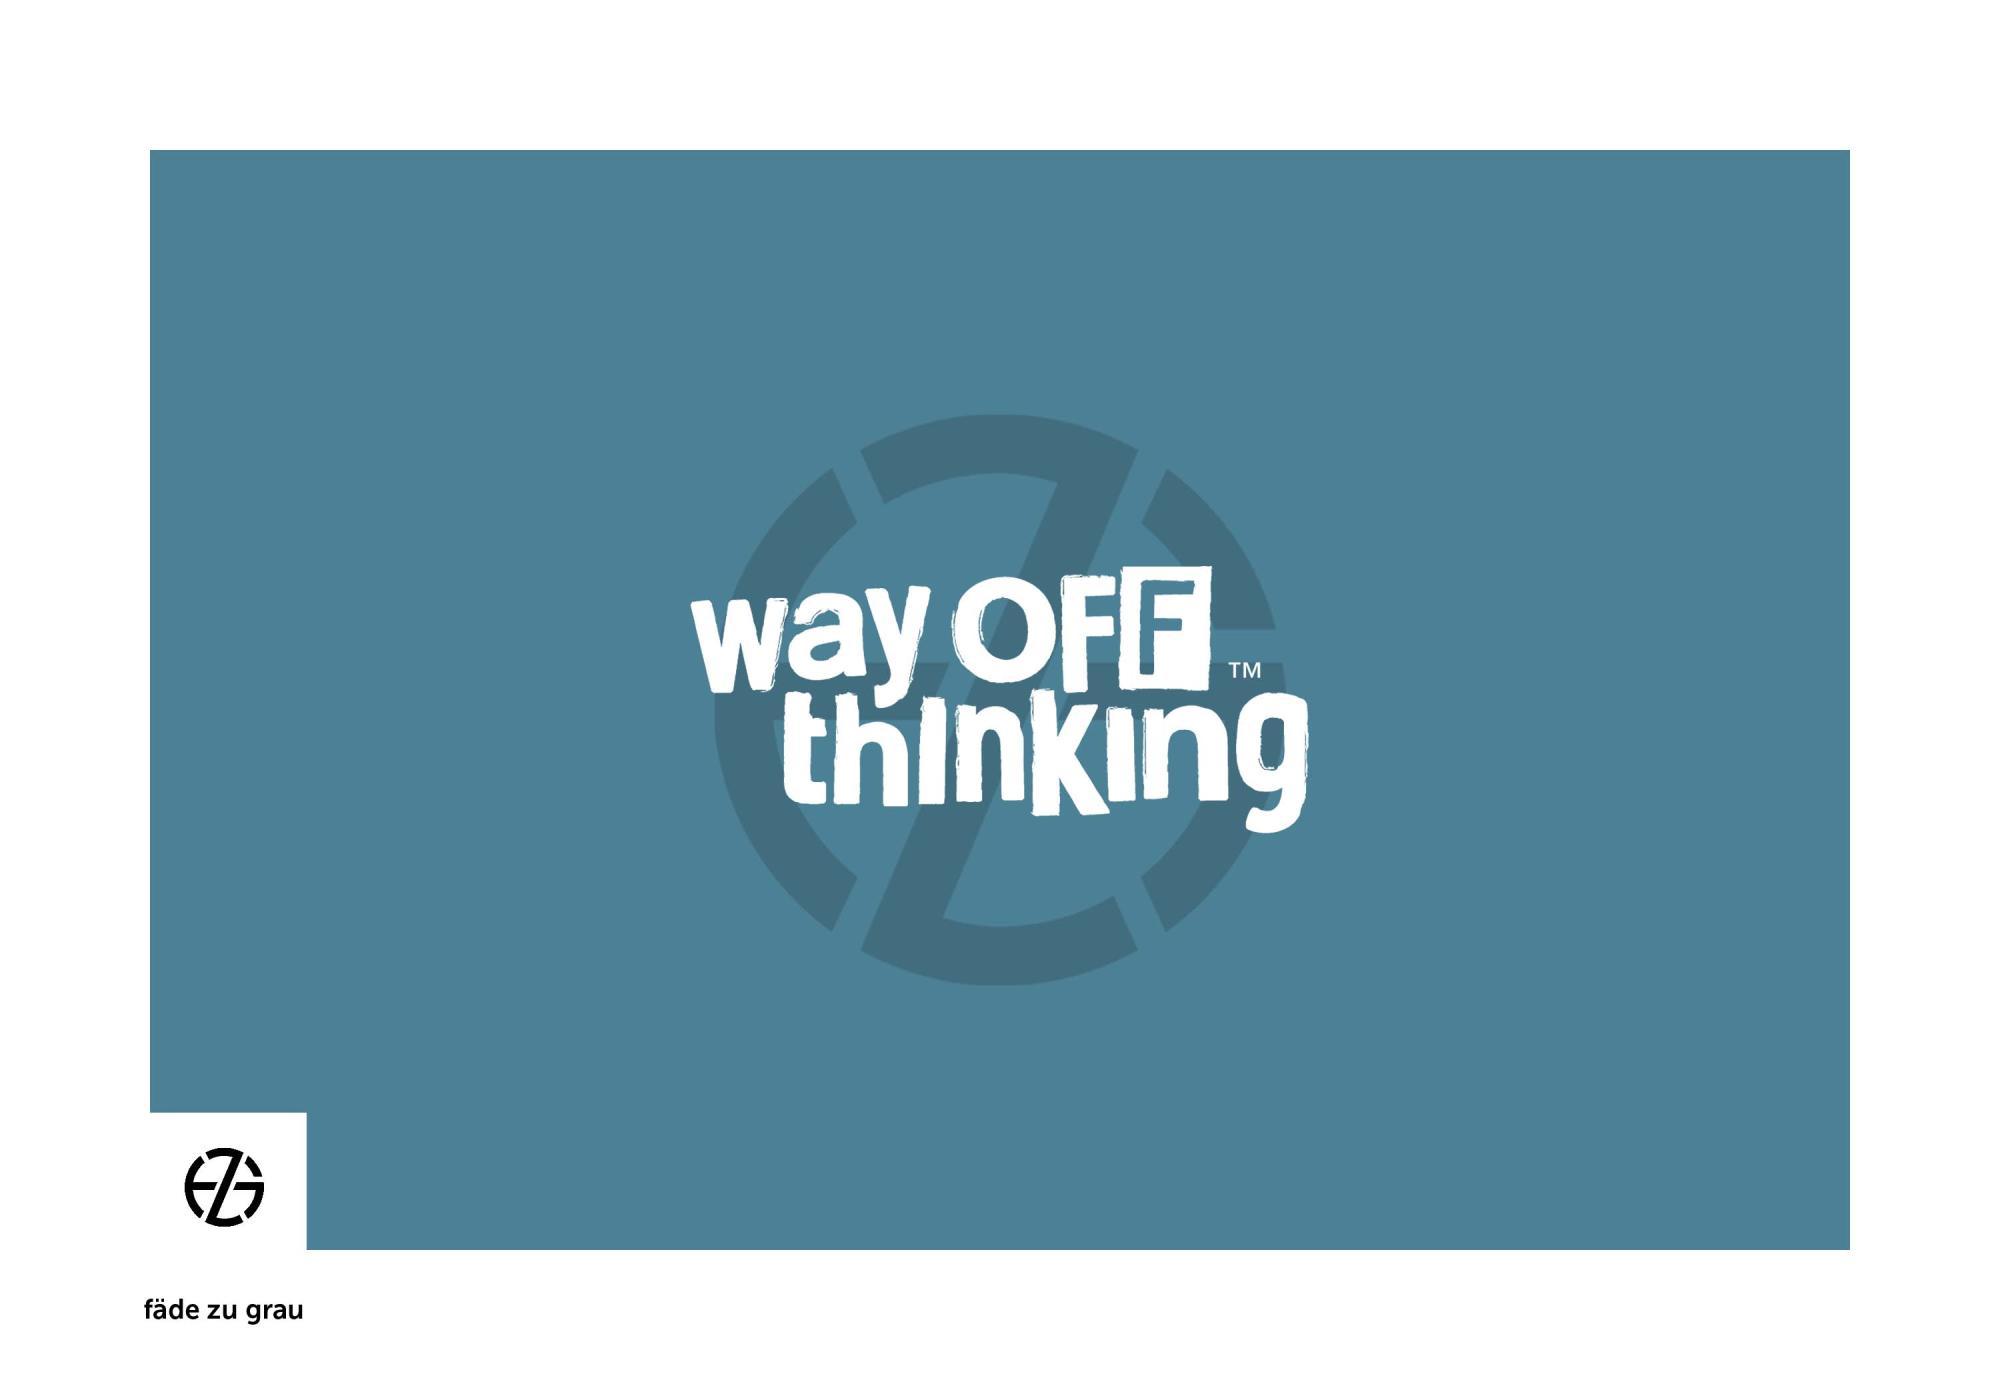 fäde zu grau | logo 'way off thinking'